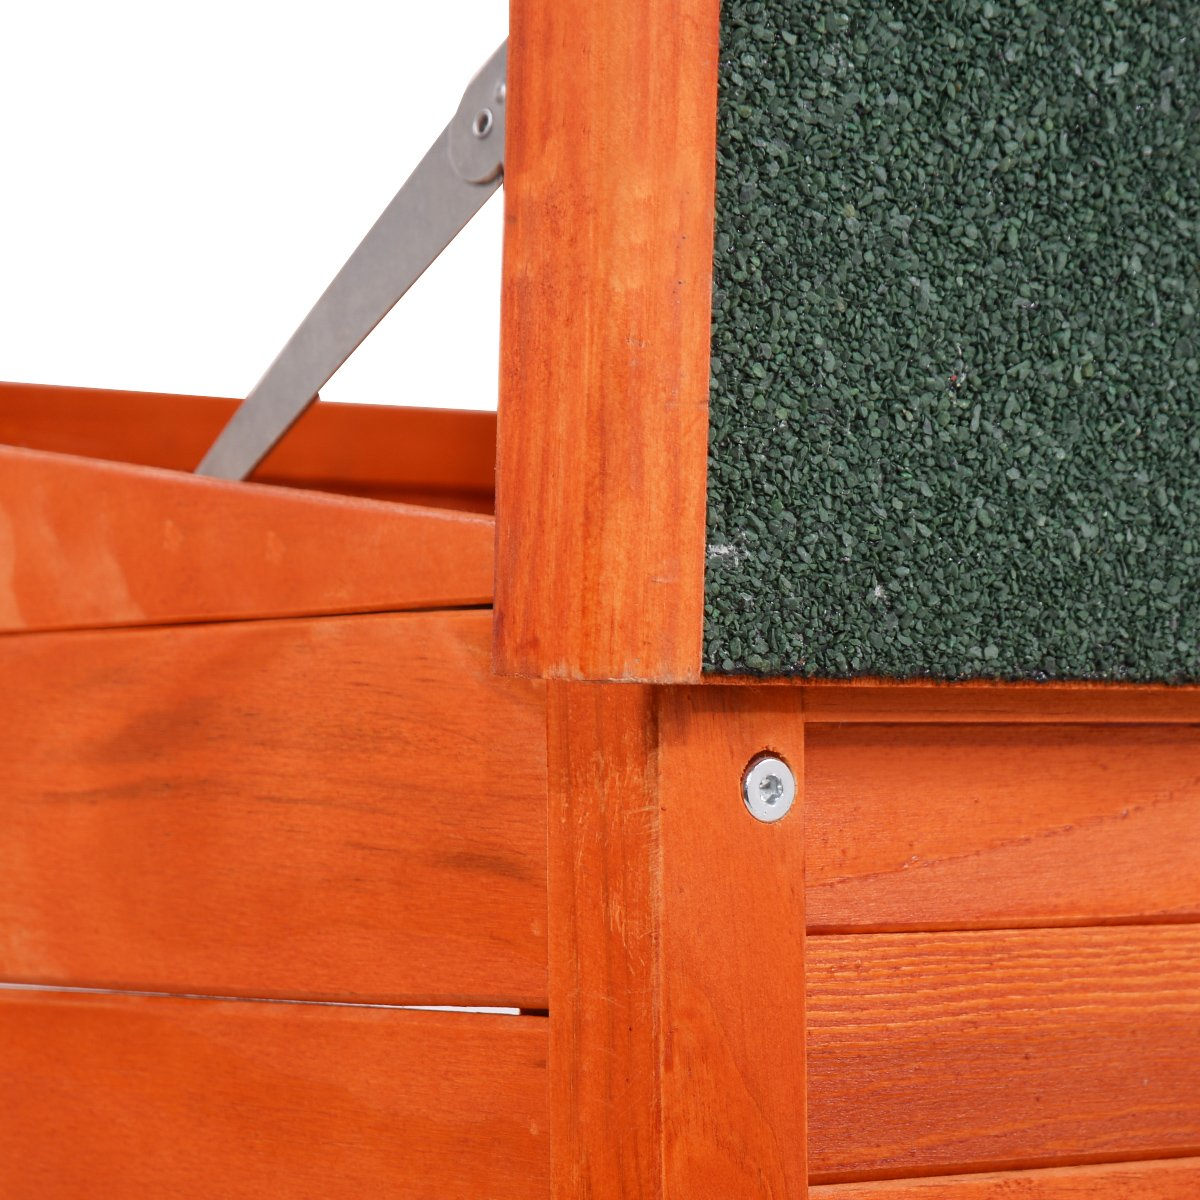 Perrera casa de madera perro mascota jaula Caseta grande XL azotea aislamiento cálida refugio casa: Amazon.es: Productos para mascotas